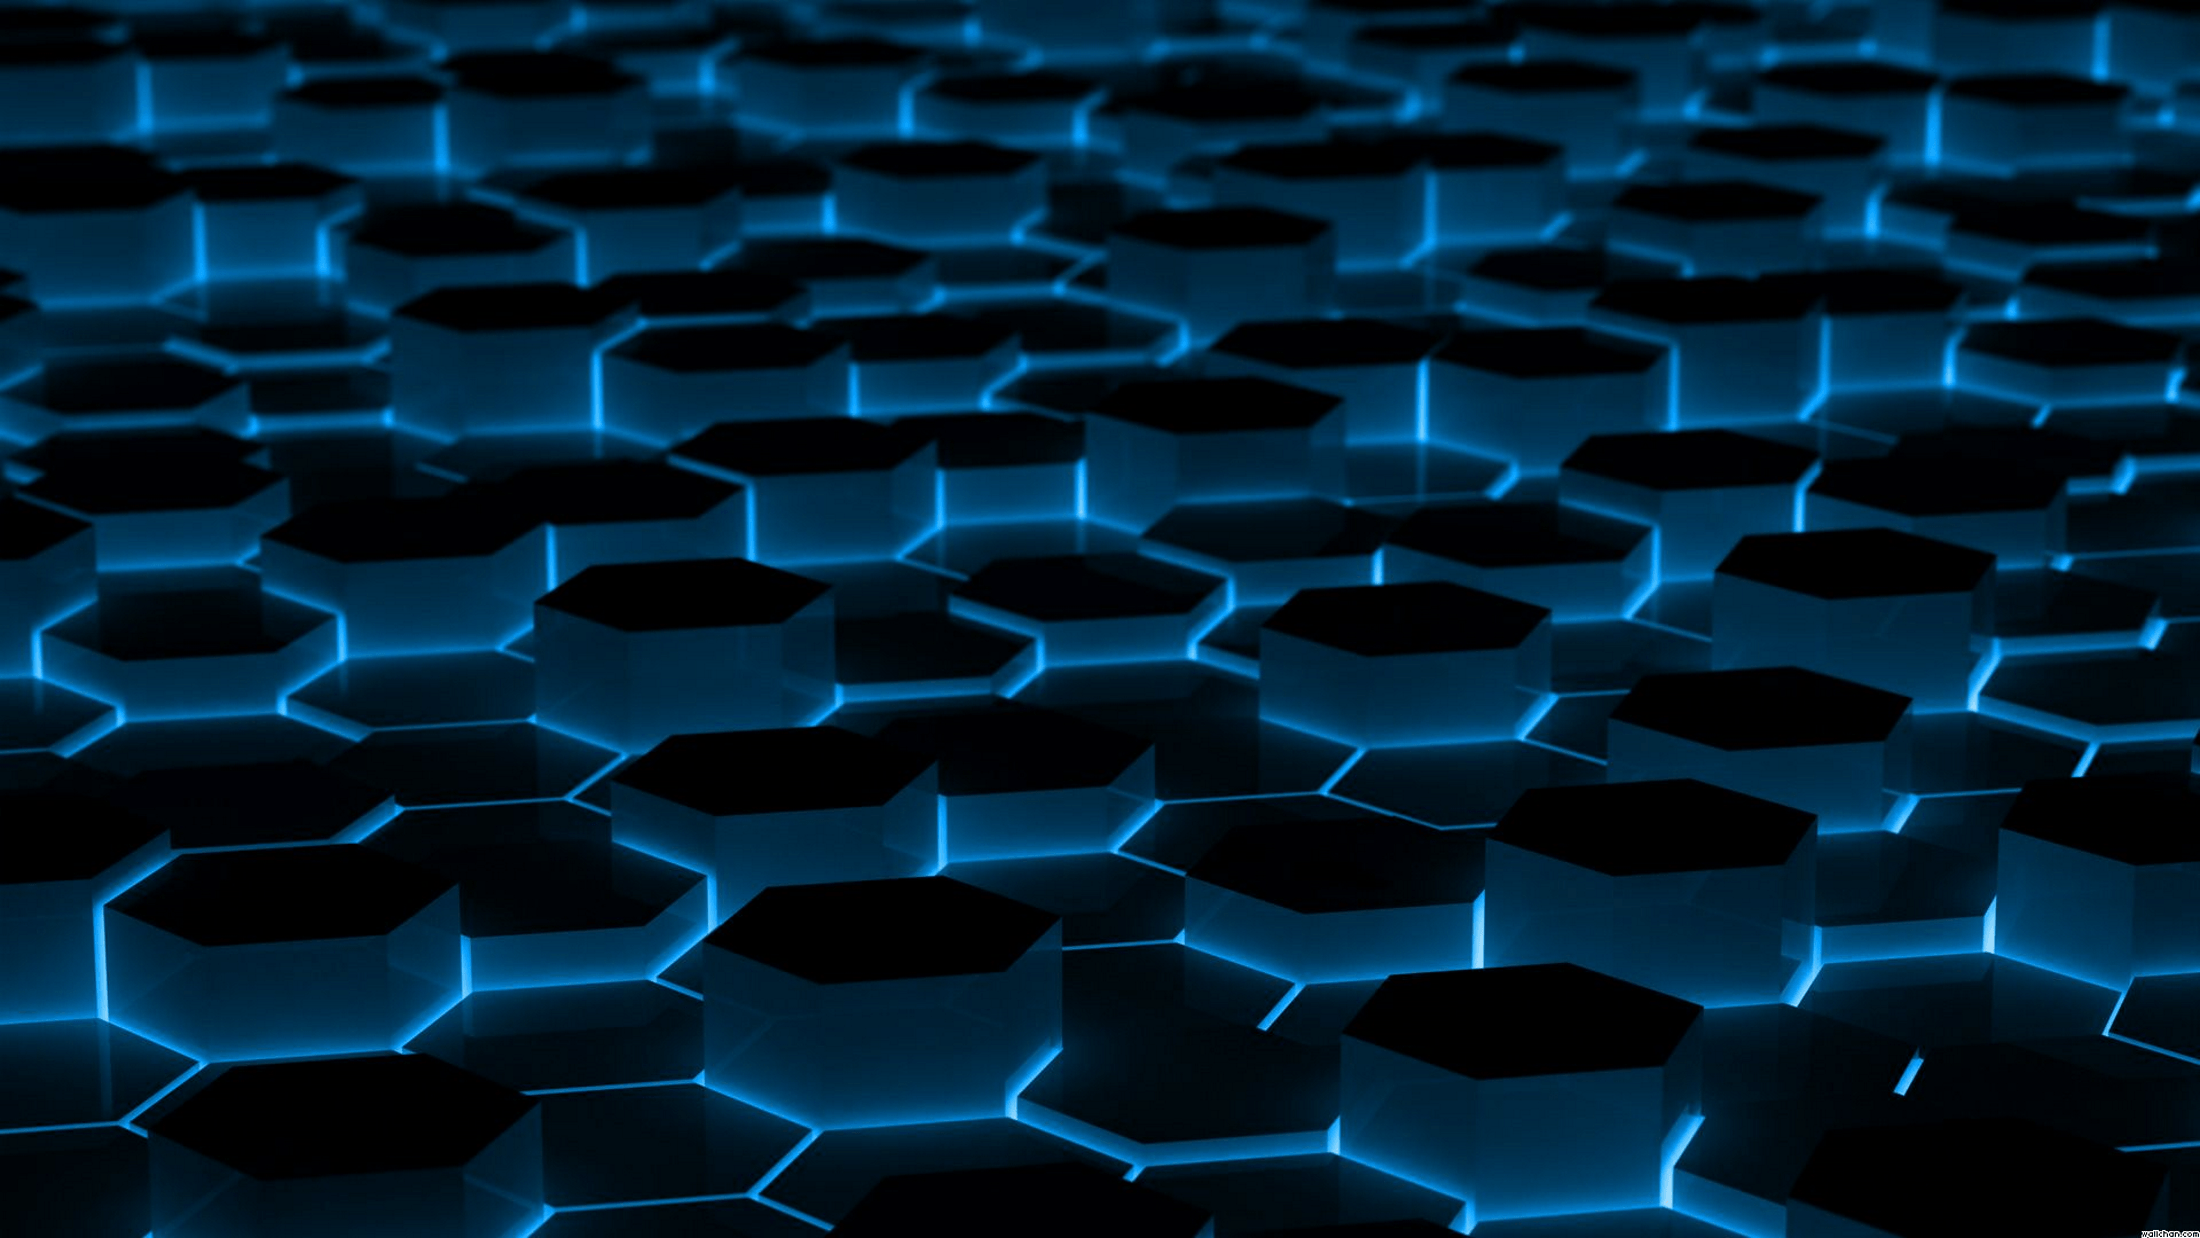 blue hex back 2200—1238 scapes Pinterest